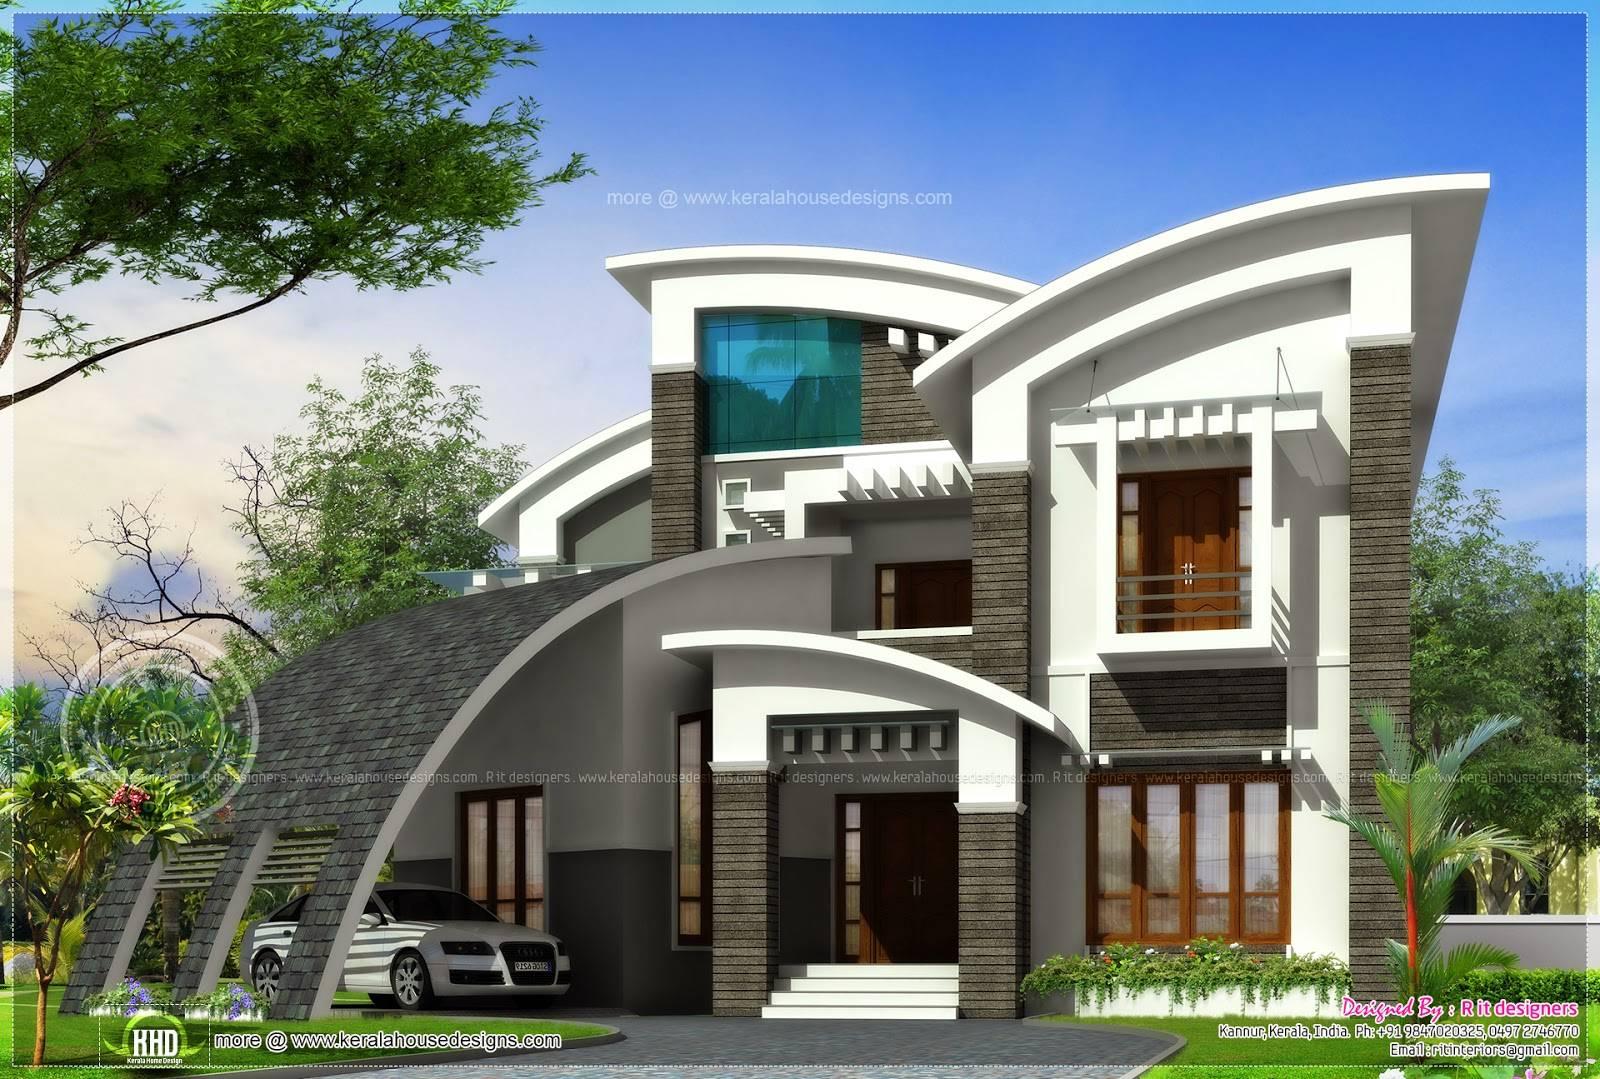 Fabulous 15 Artistic Super Modern Homes House Plans 70980 Largest Home Design Picture Inspirations Pitcheantrous